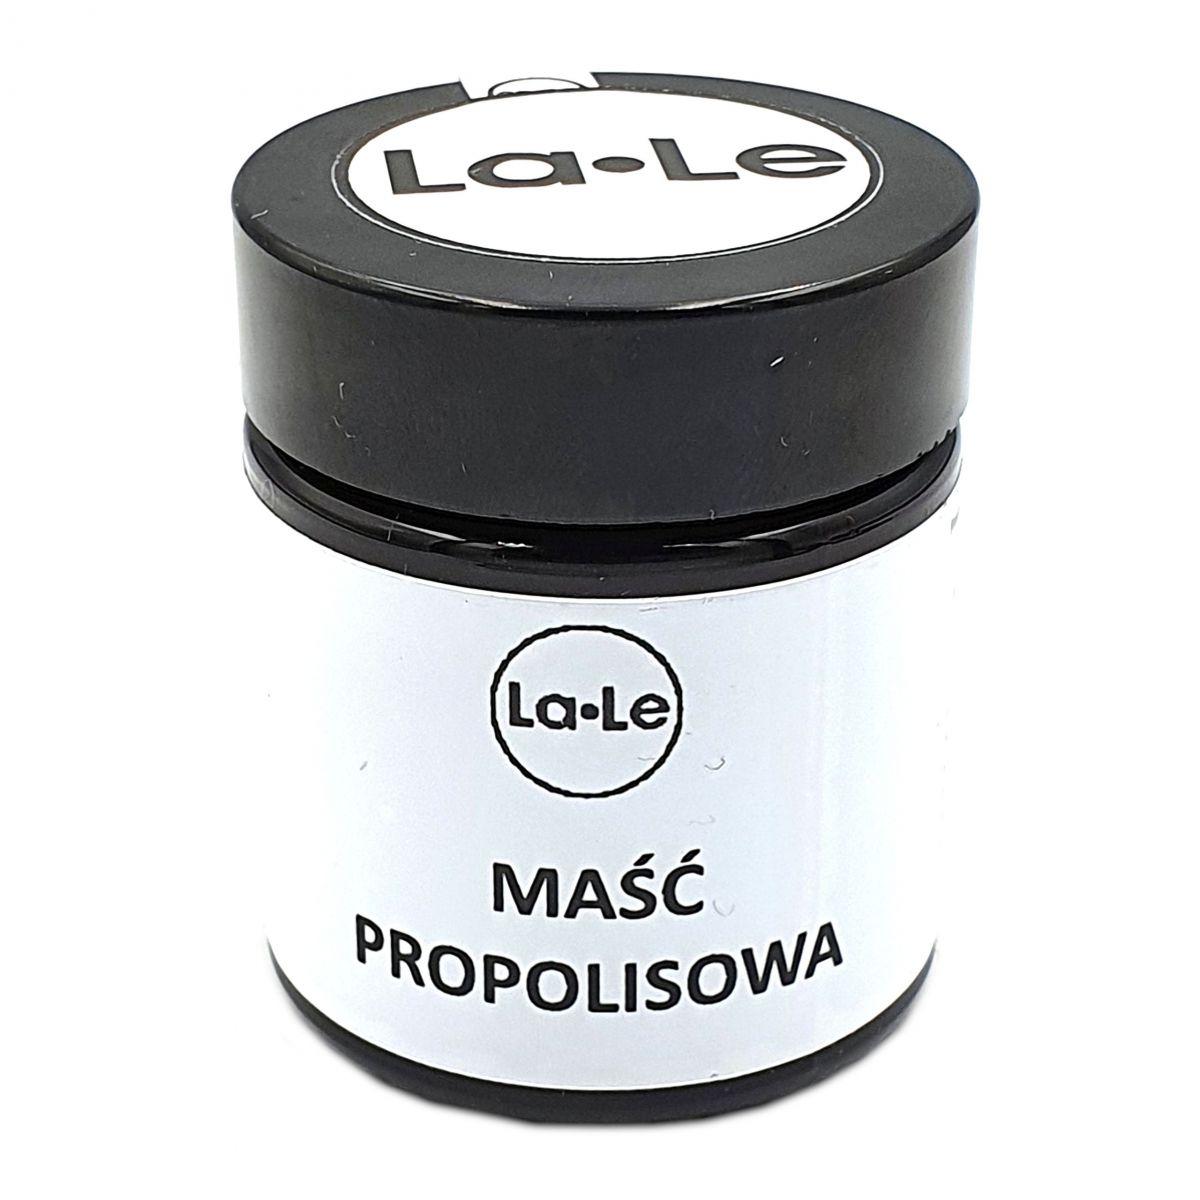 Maść Propolisowa - 30ml - La-Le